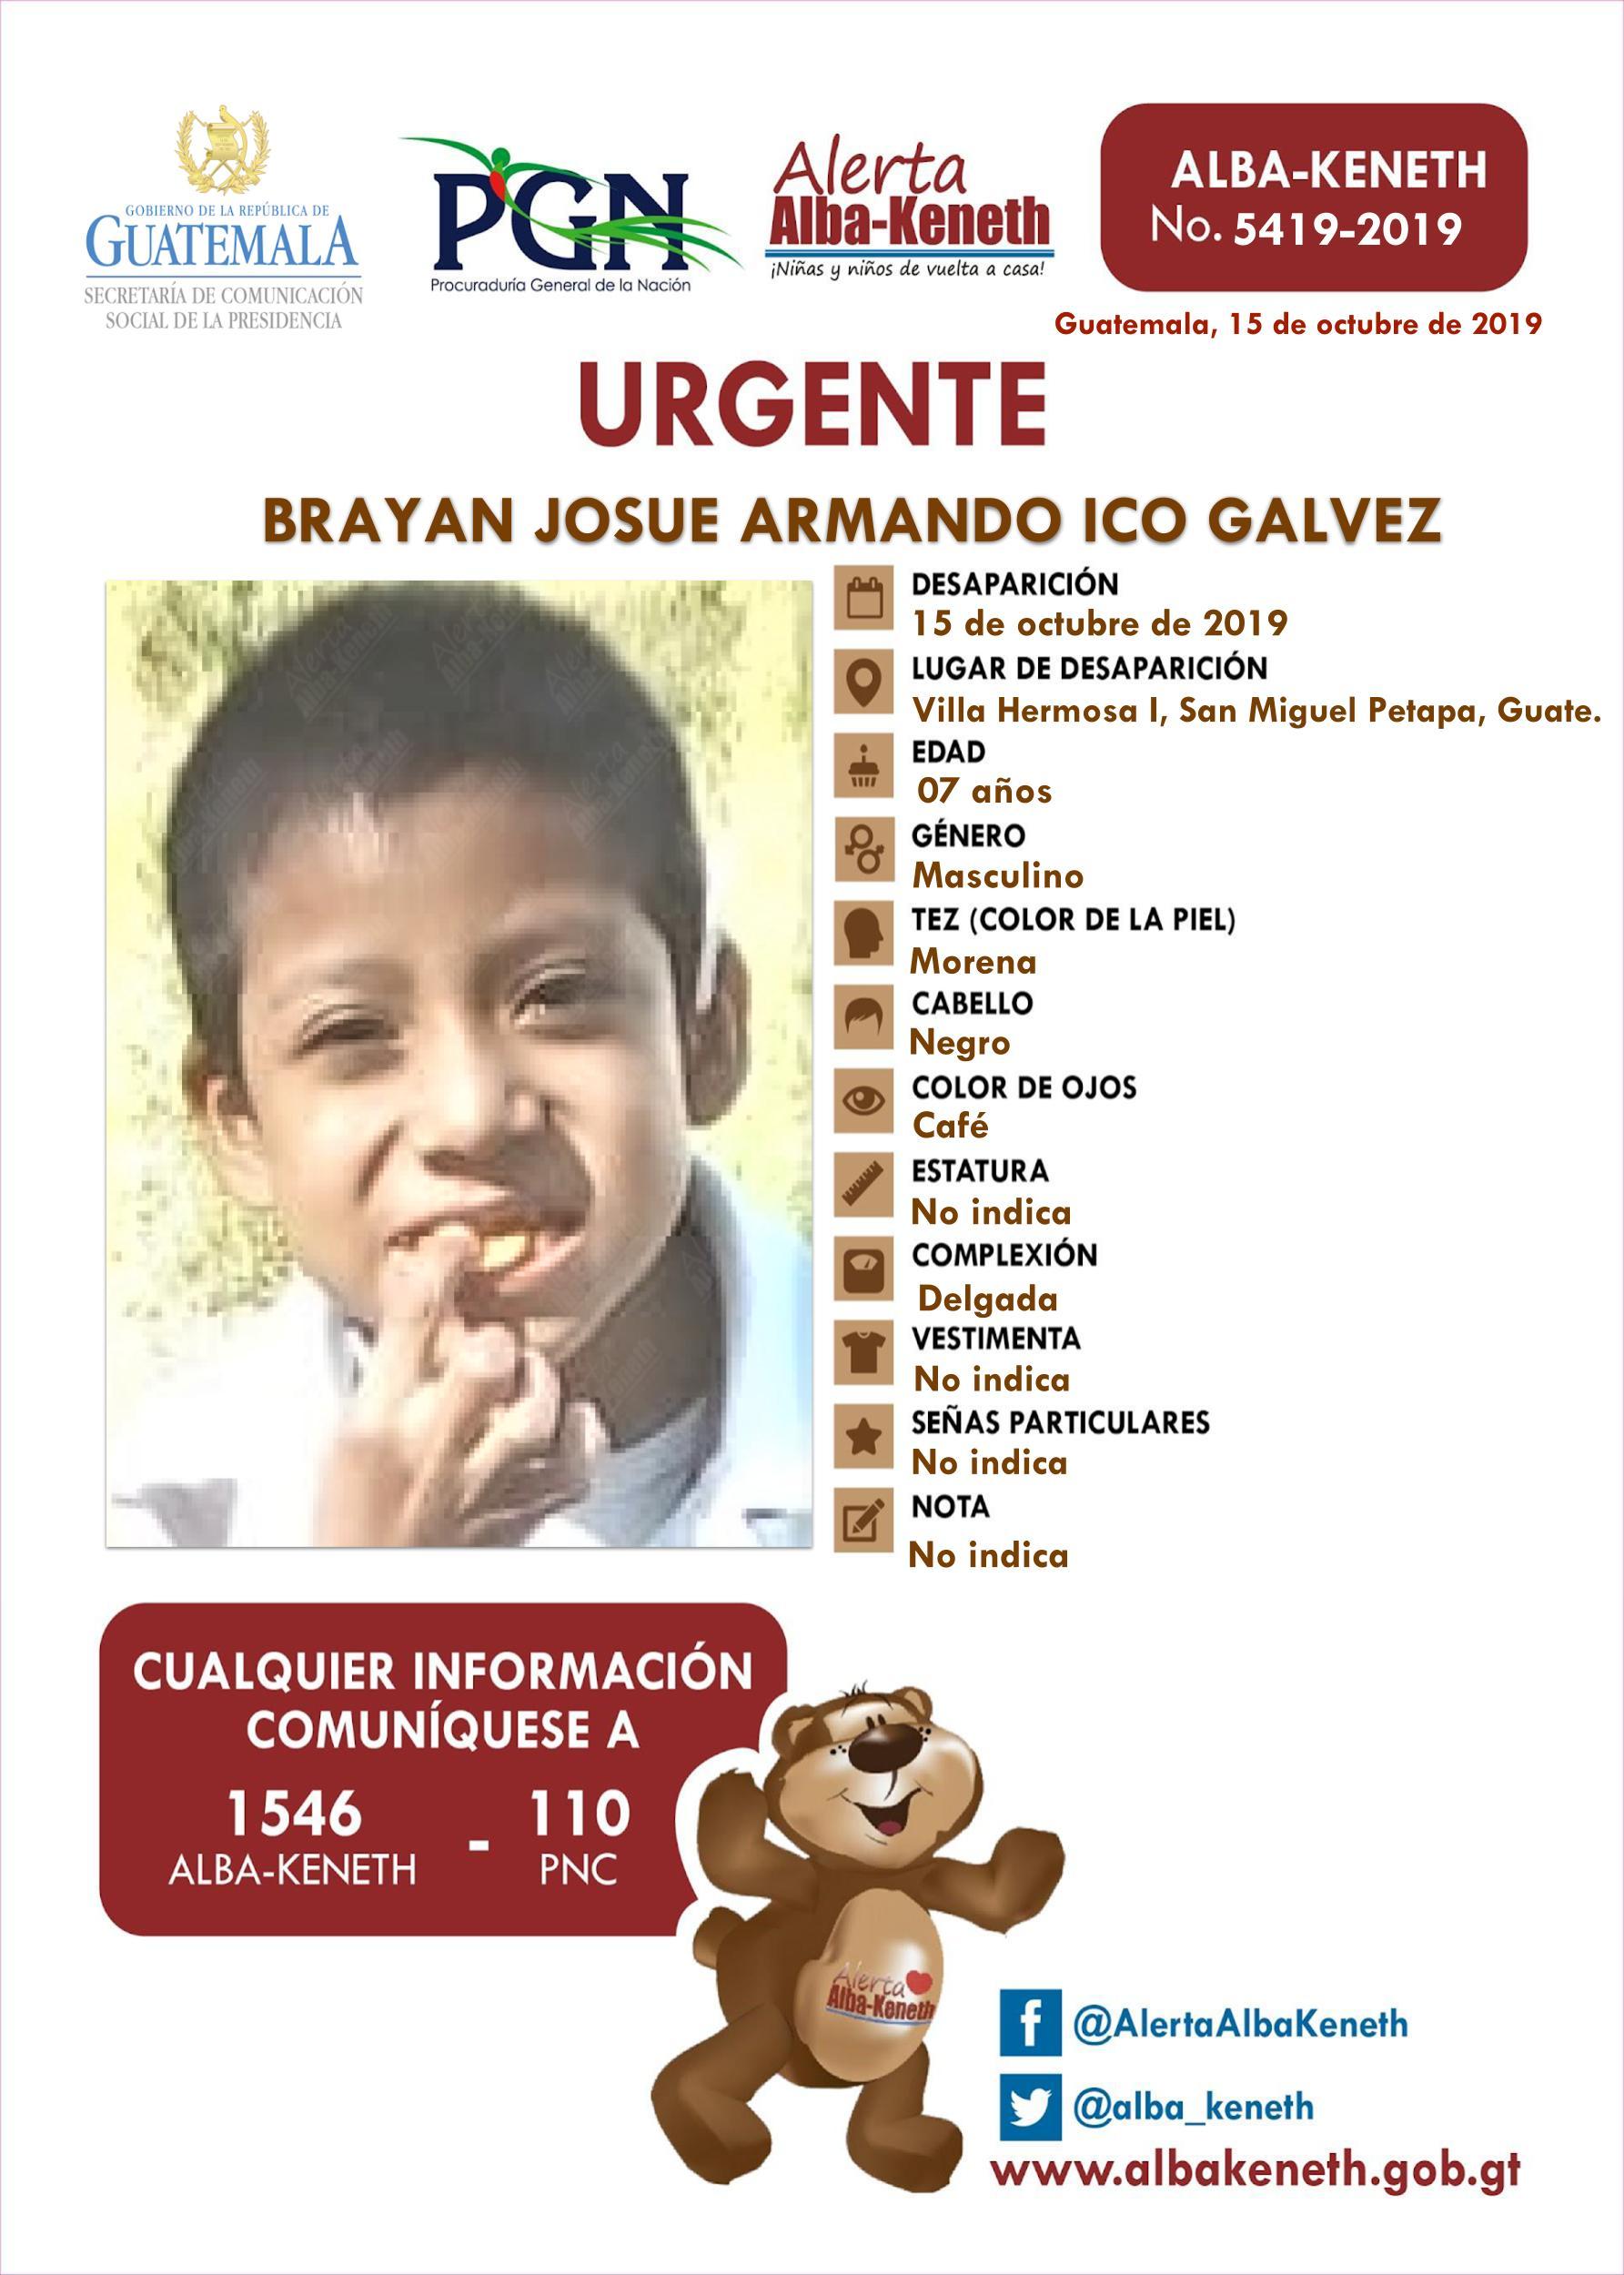 Brayan Josue Armando Ico Galvez